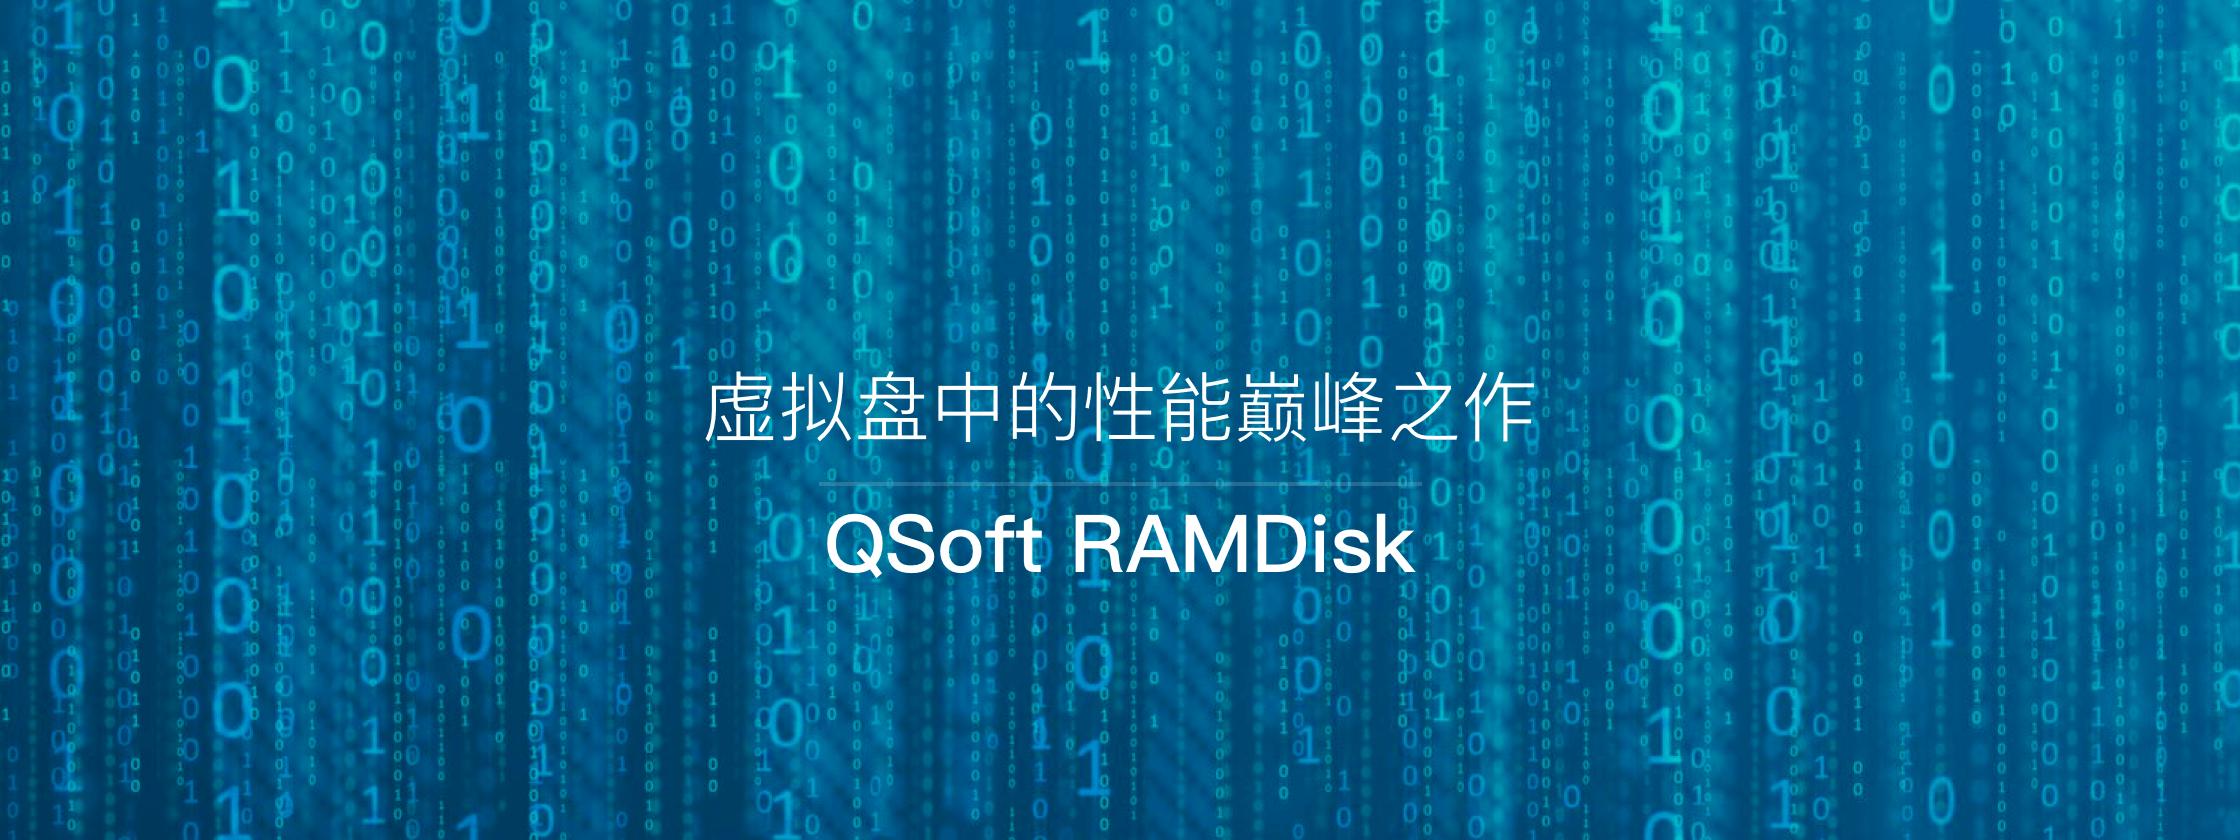 QSoft RAMDisk Enterprise – 虚拟盘中的性能巅峰之作